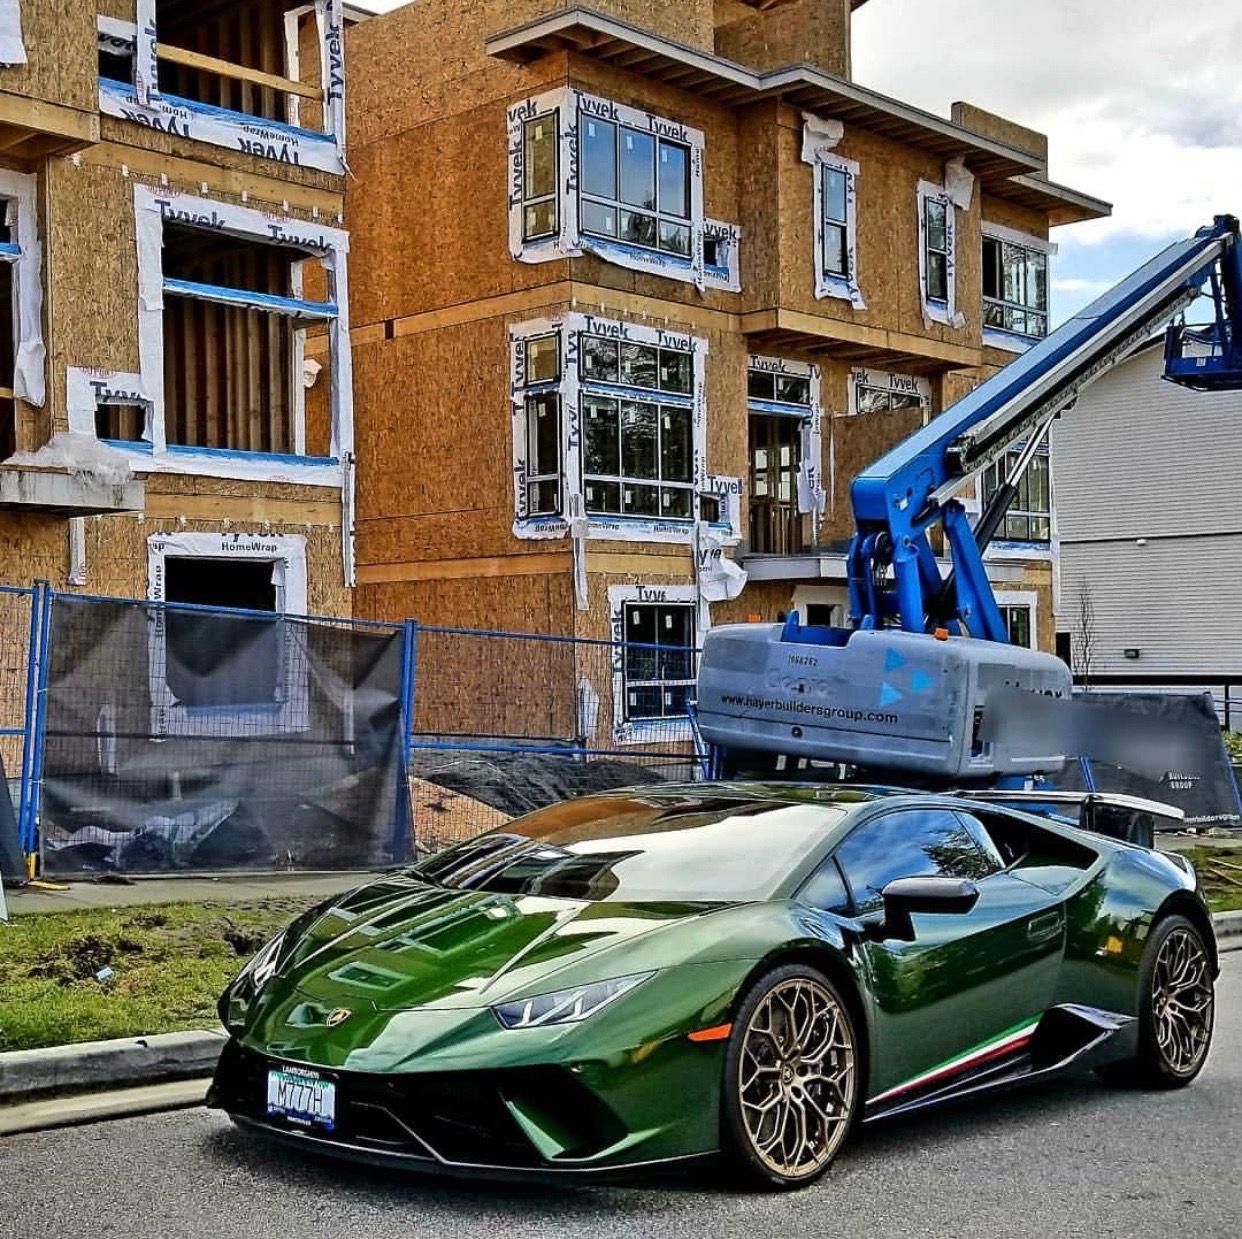 Lamborghini Huracan Performante painted in Verde Ermes w/ Tricolore on